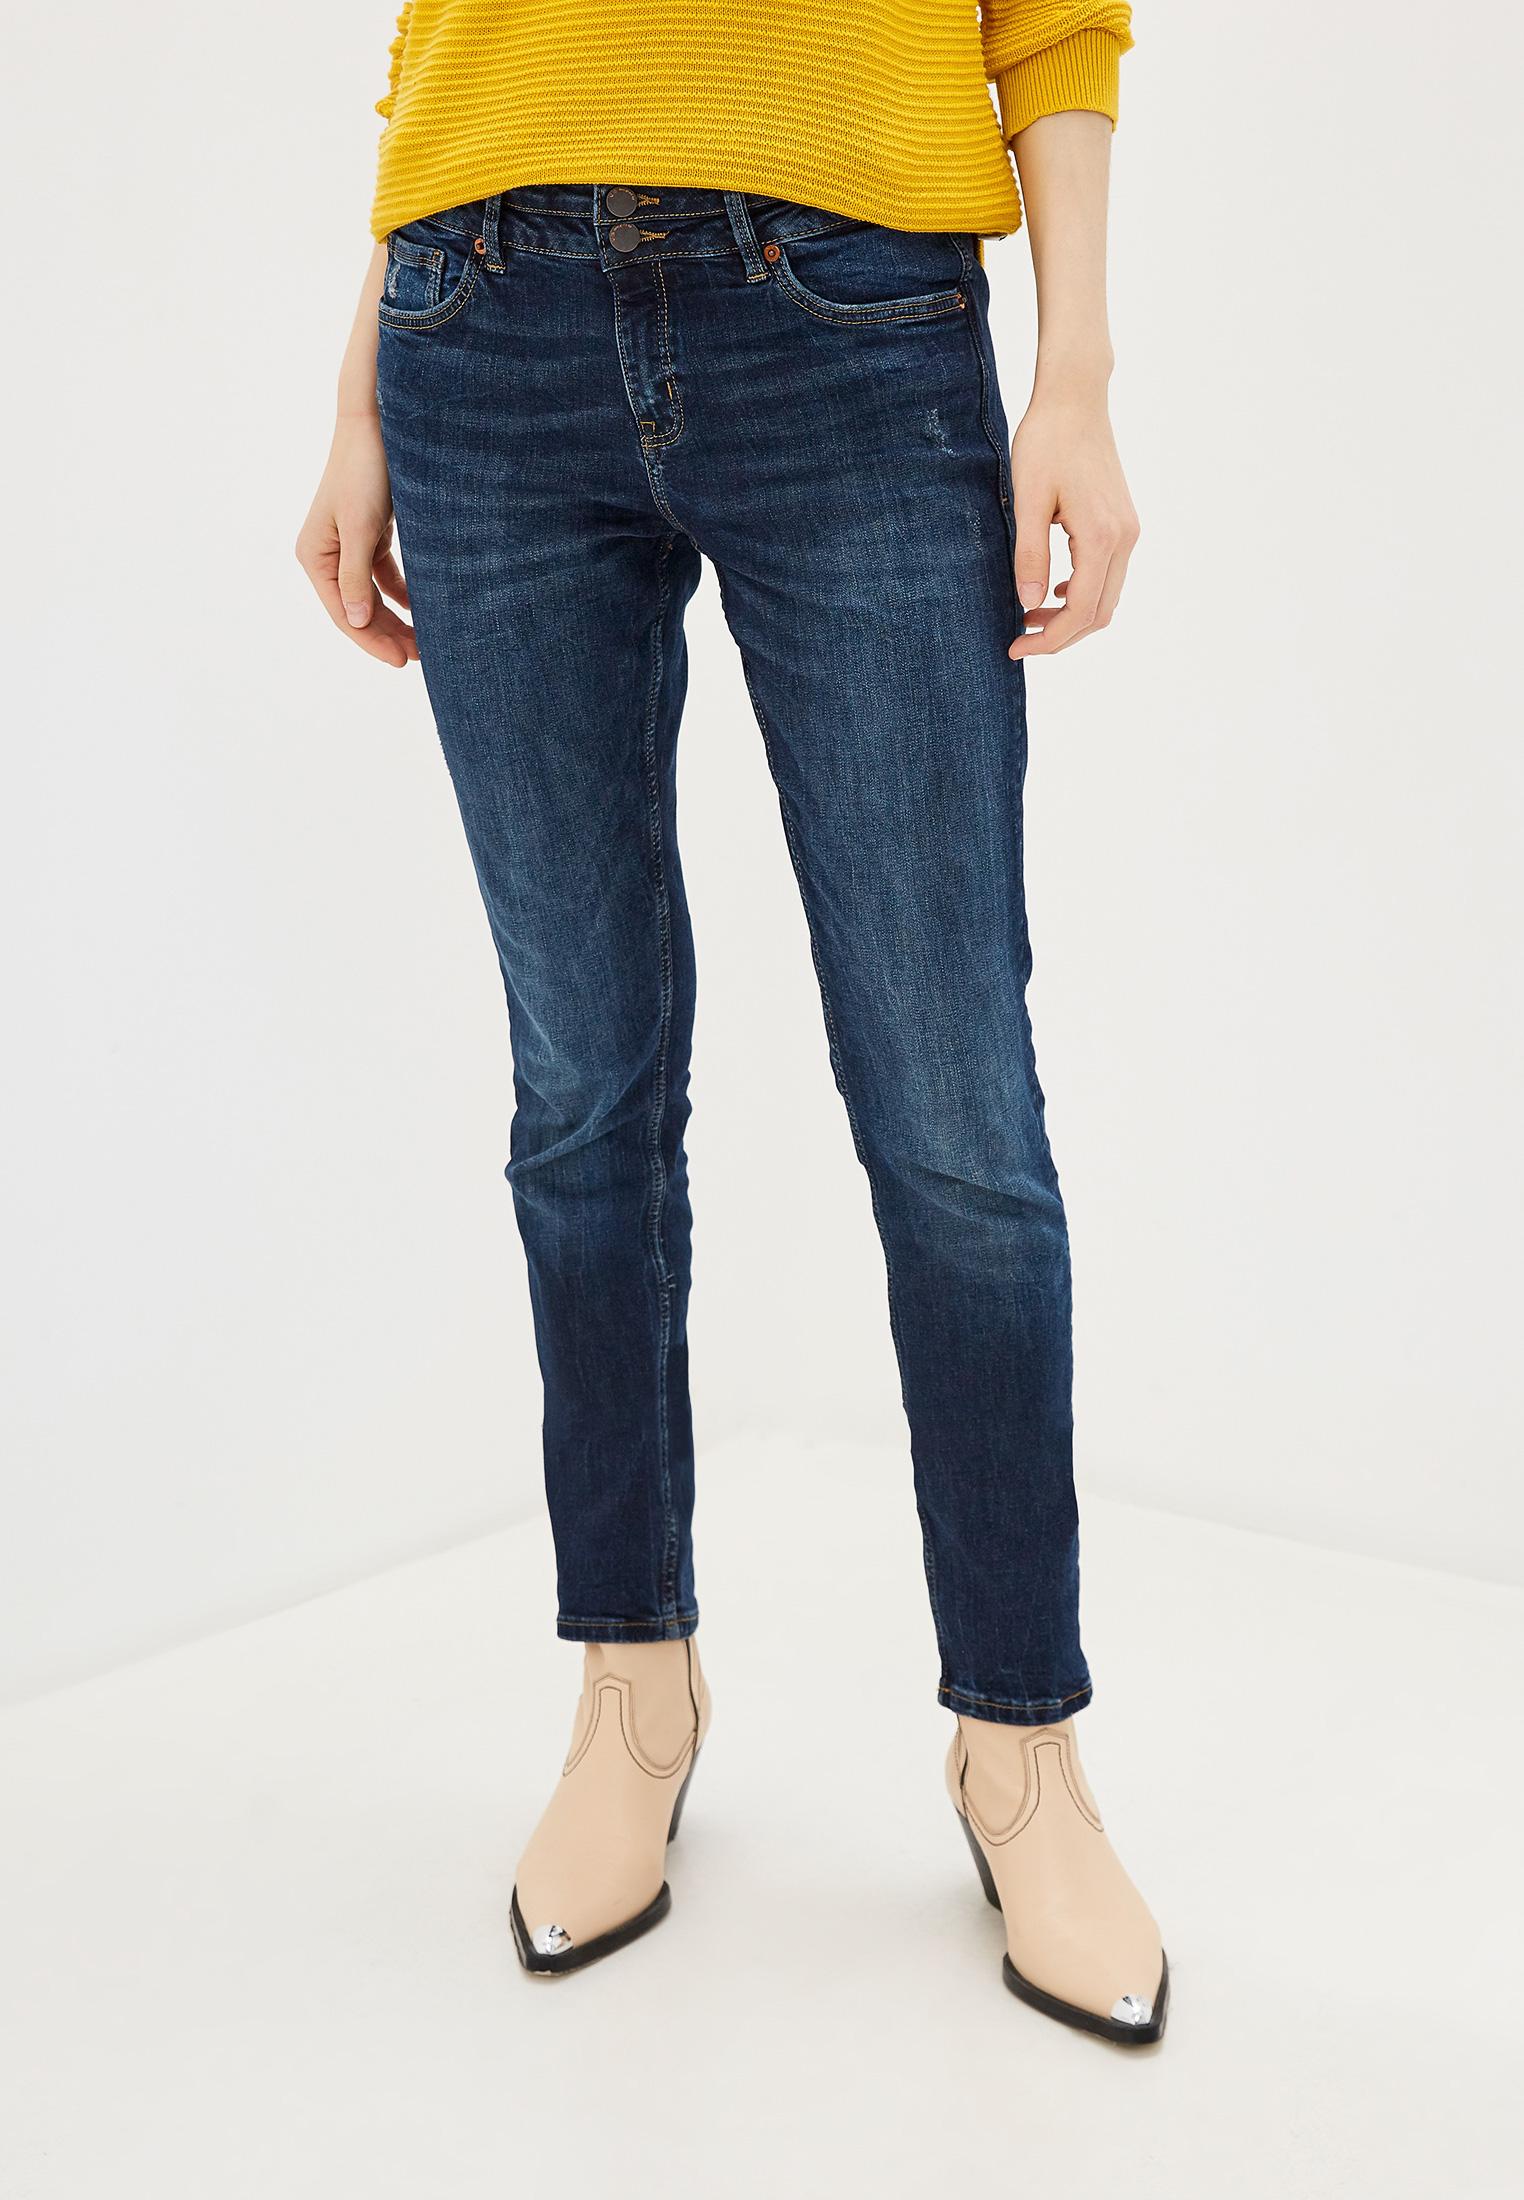 Зауженные джинсы Q/S designed by 41.910.71.3190